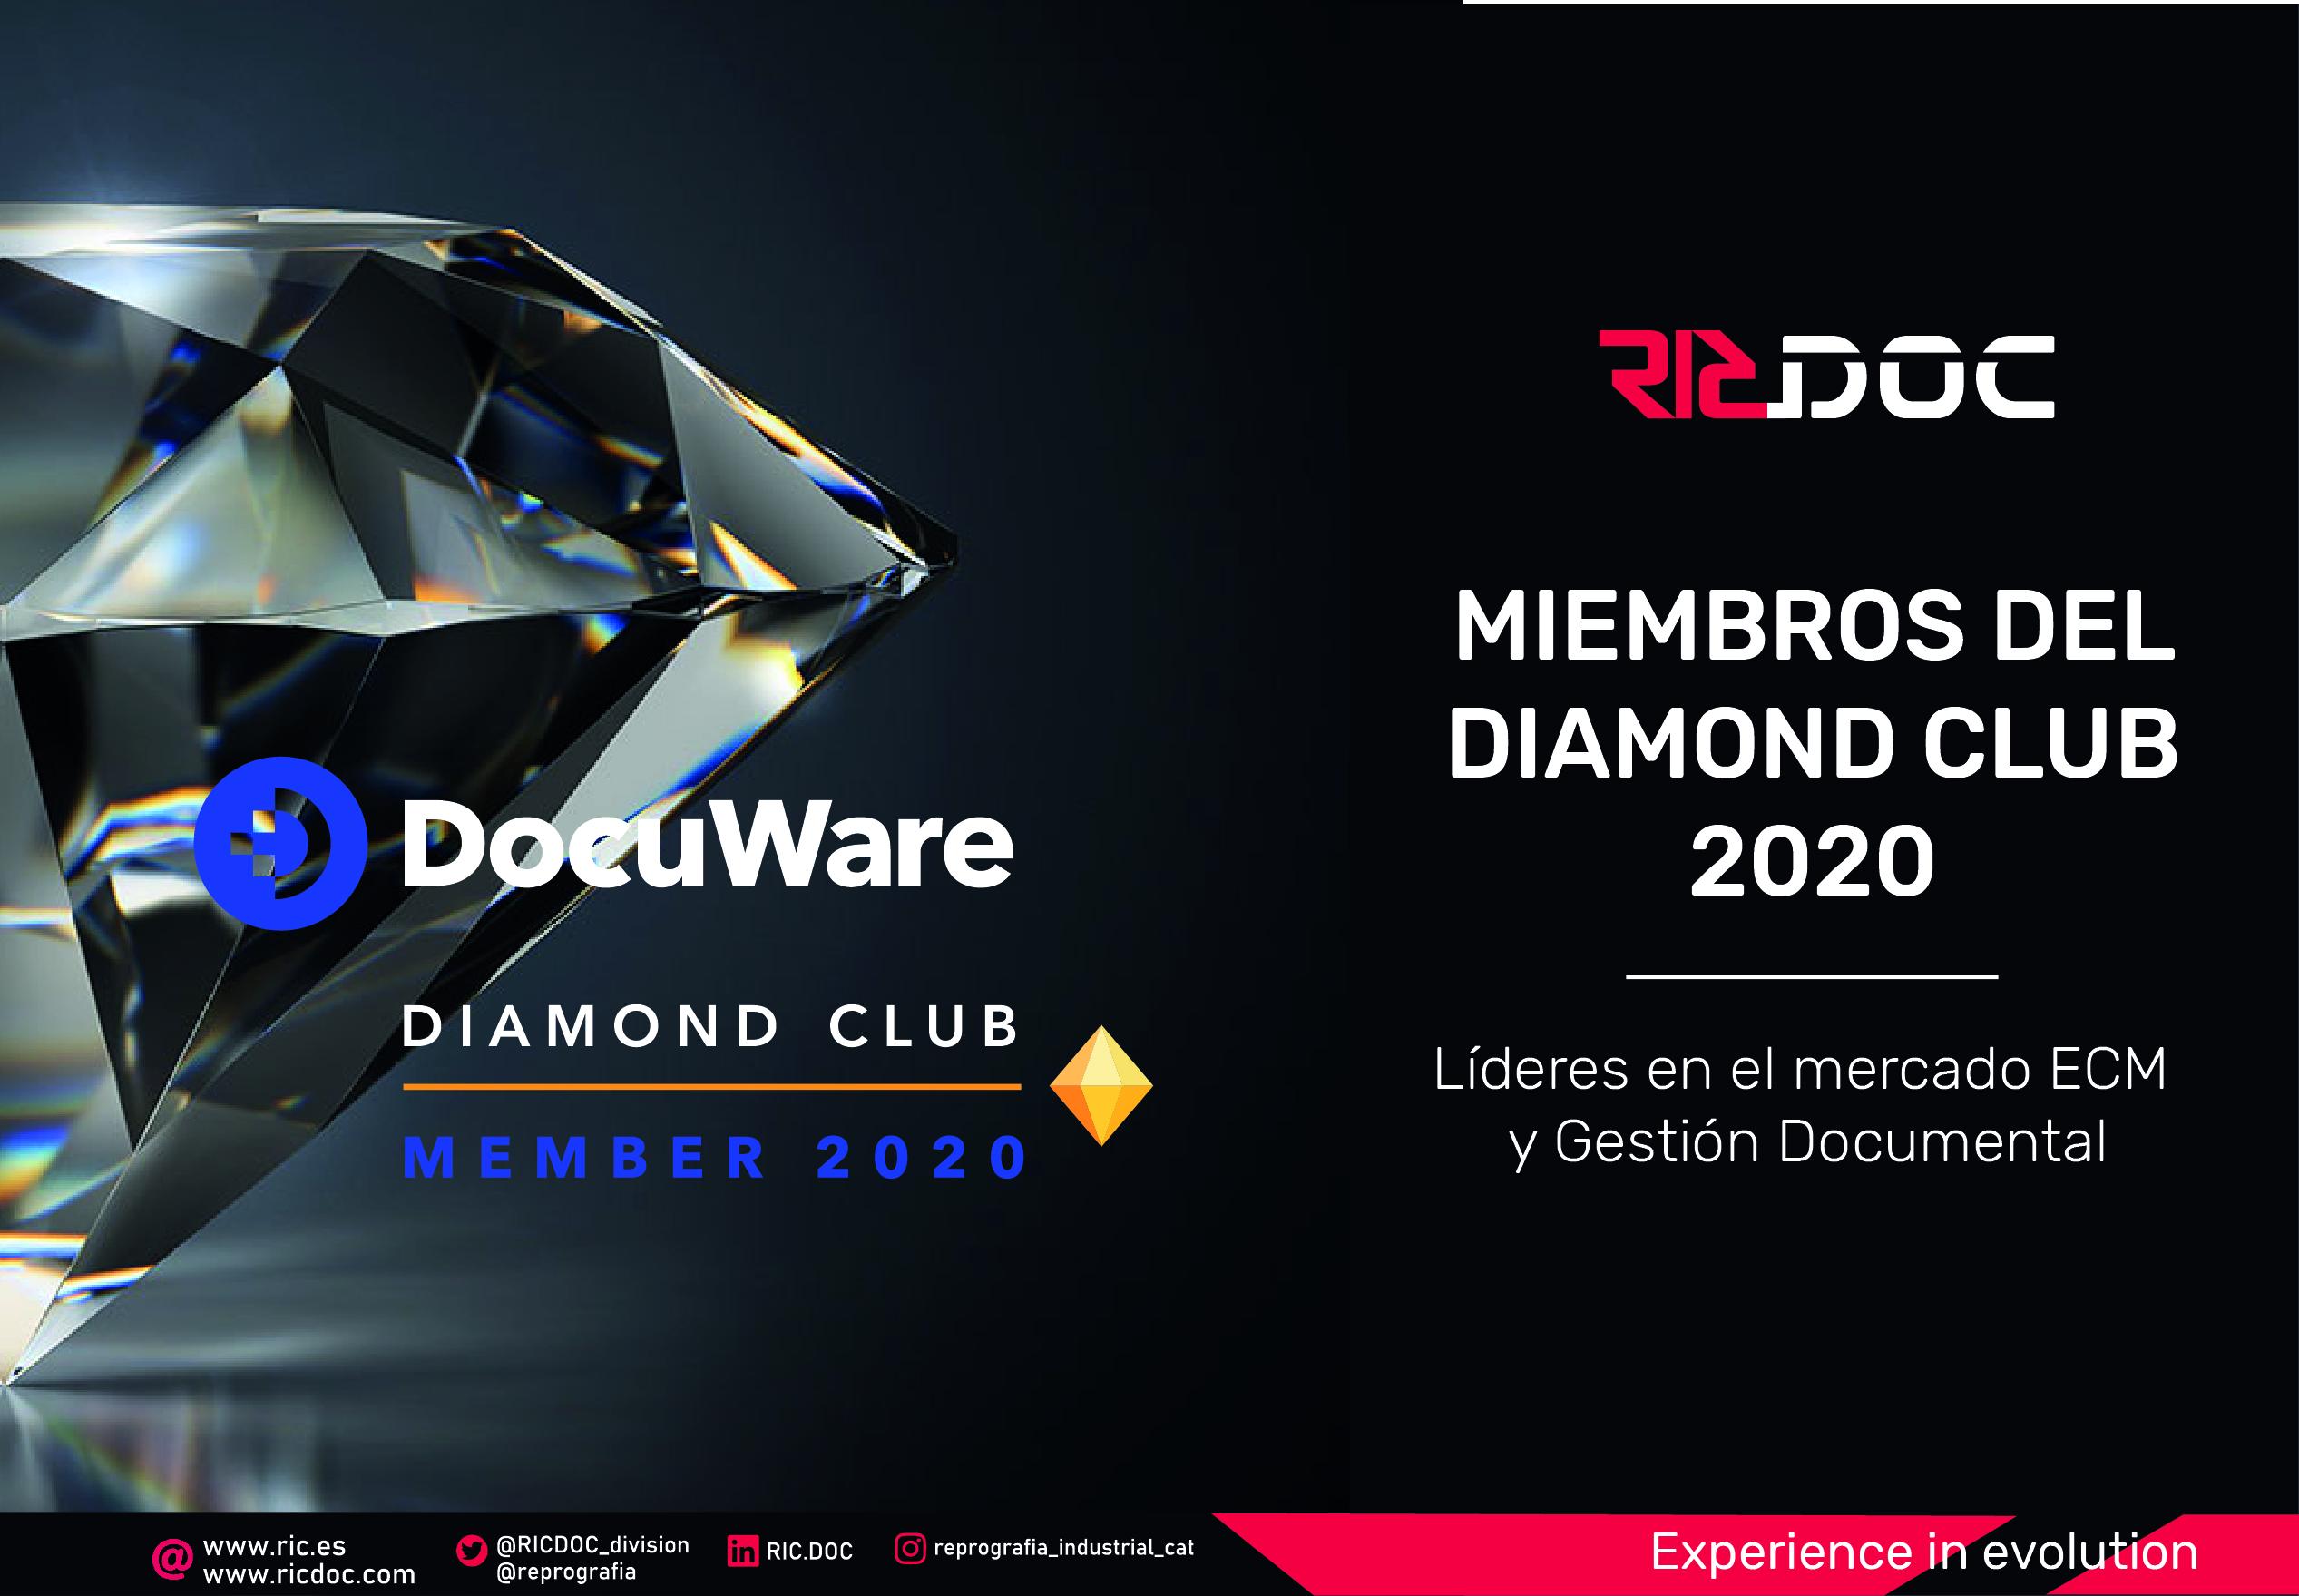 RICDOC ENTRA A LA CATEGORIA DIAMOND CLUB PARTNER 2020 DE DOCUWARE